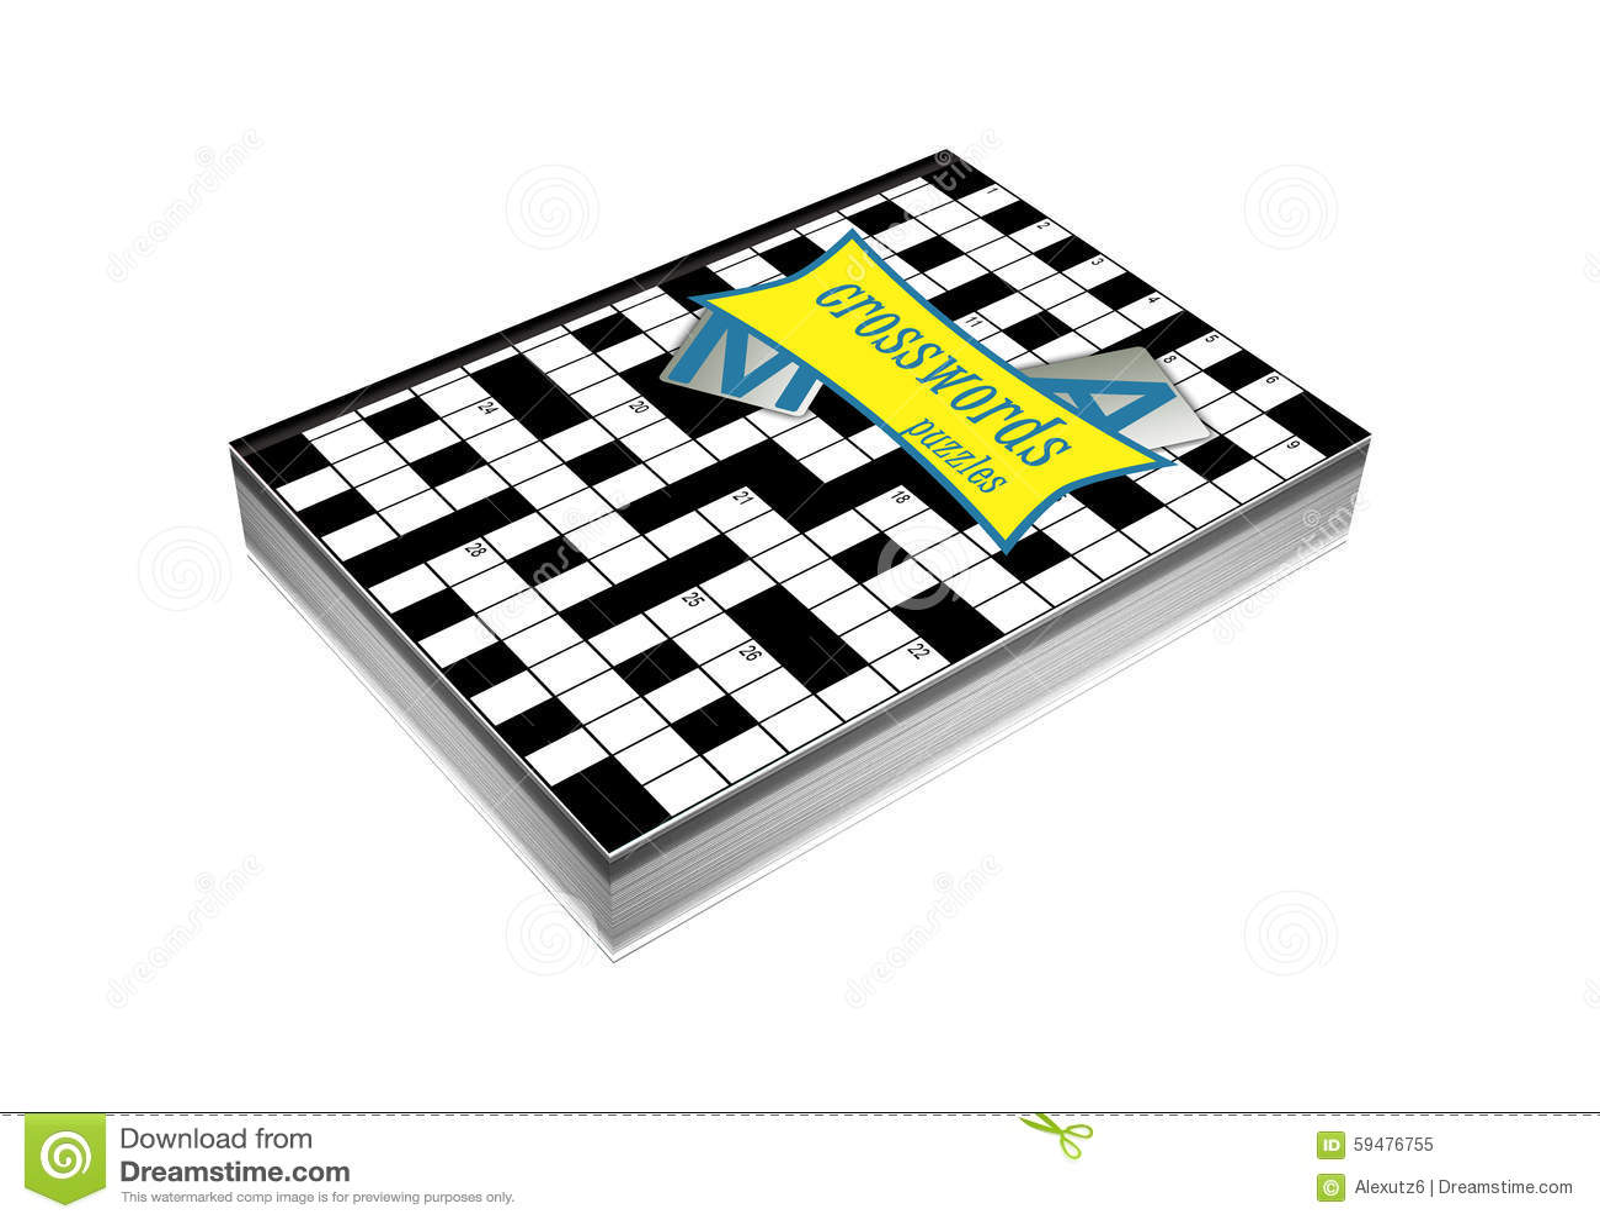 Book Cover Portadas Crossword ~ Crosswords book cover stock illustration image